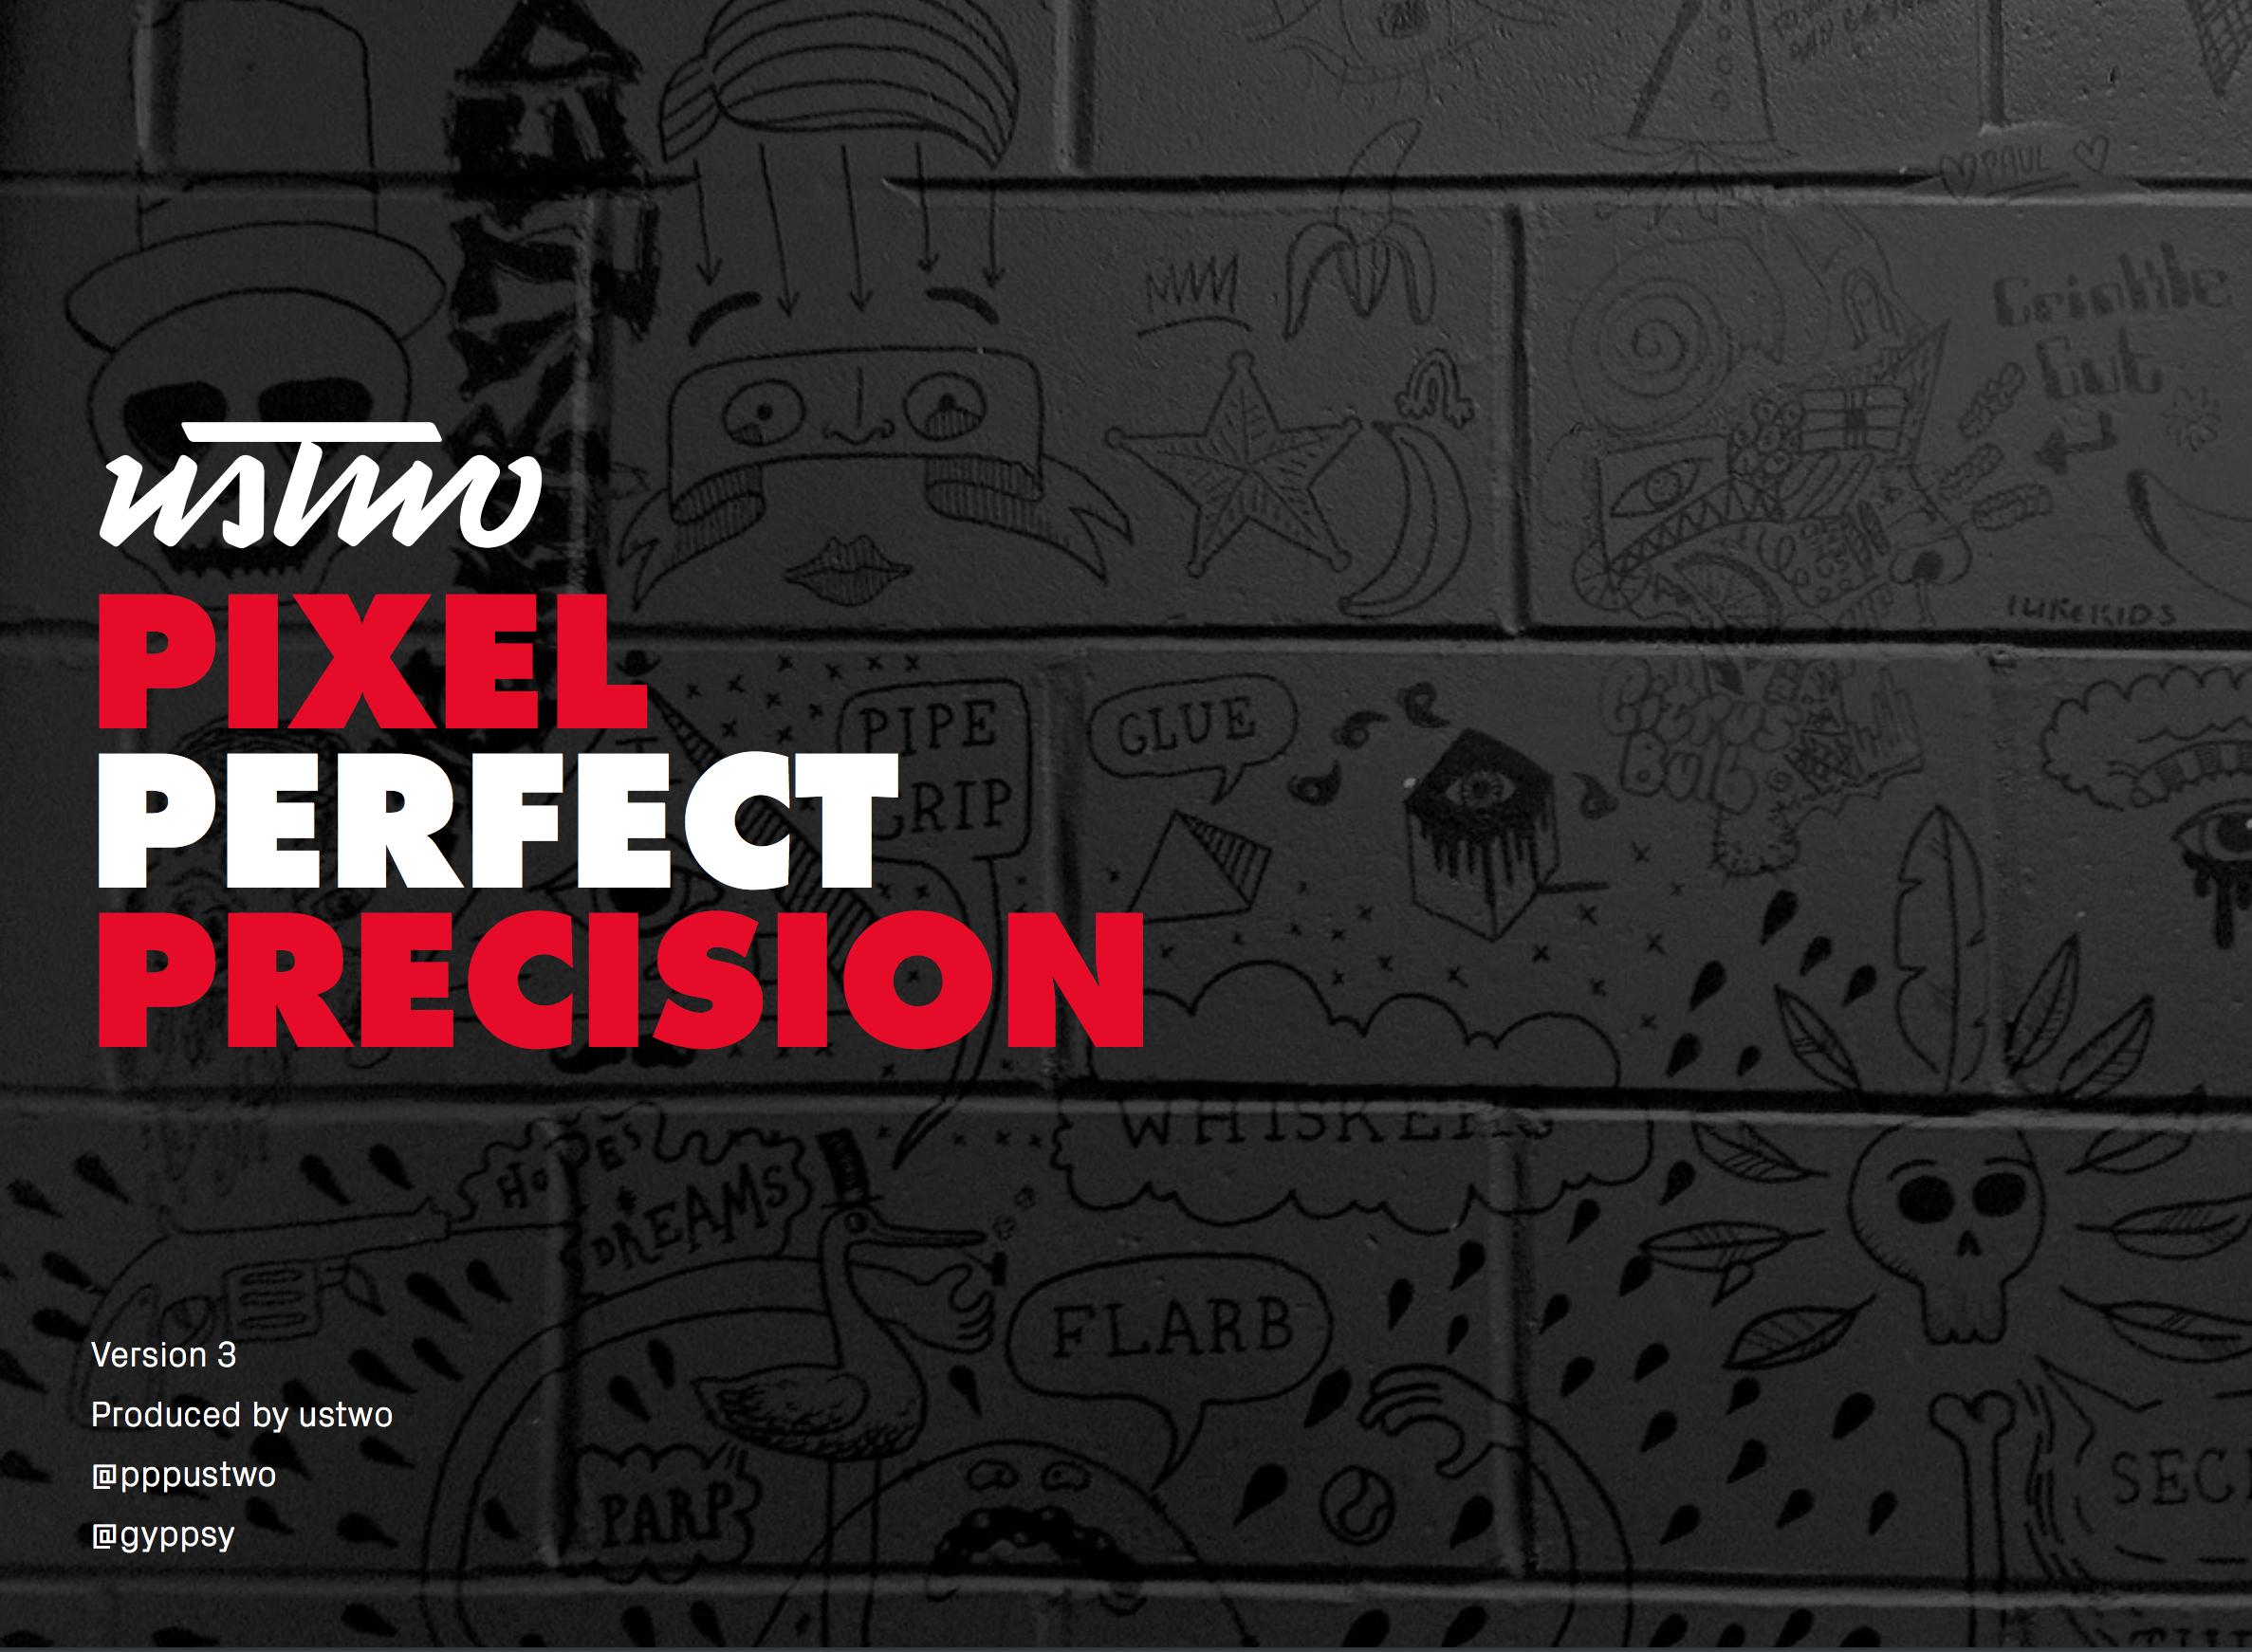 Pixel Perfect Precision Handbook 3 — Matt Gypps